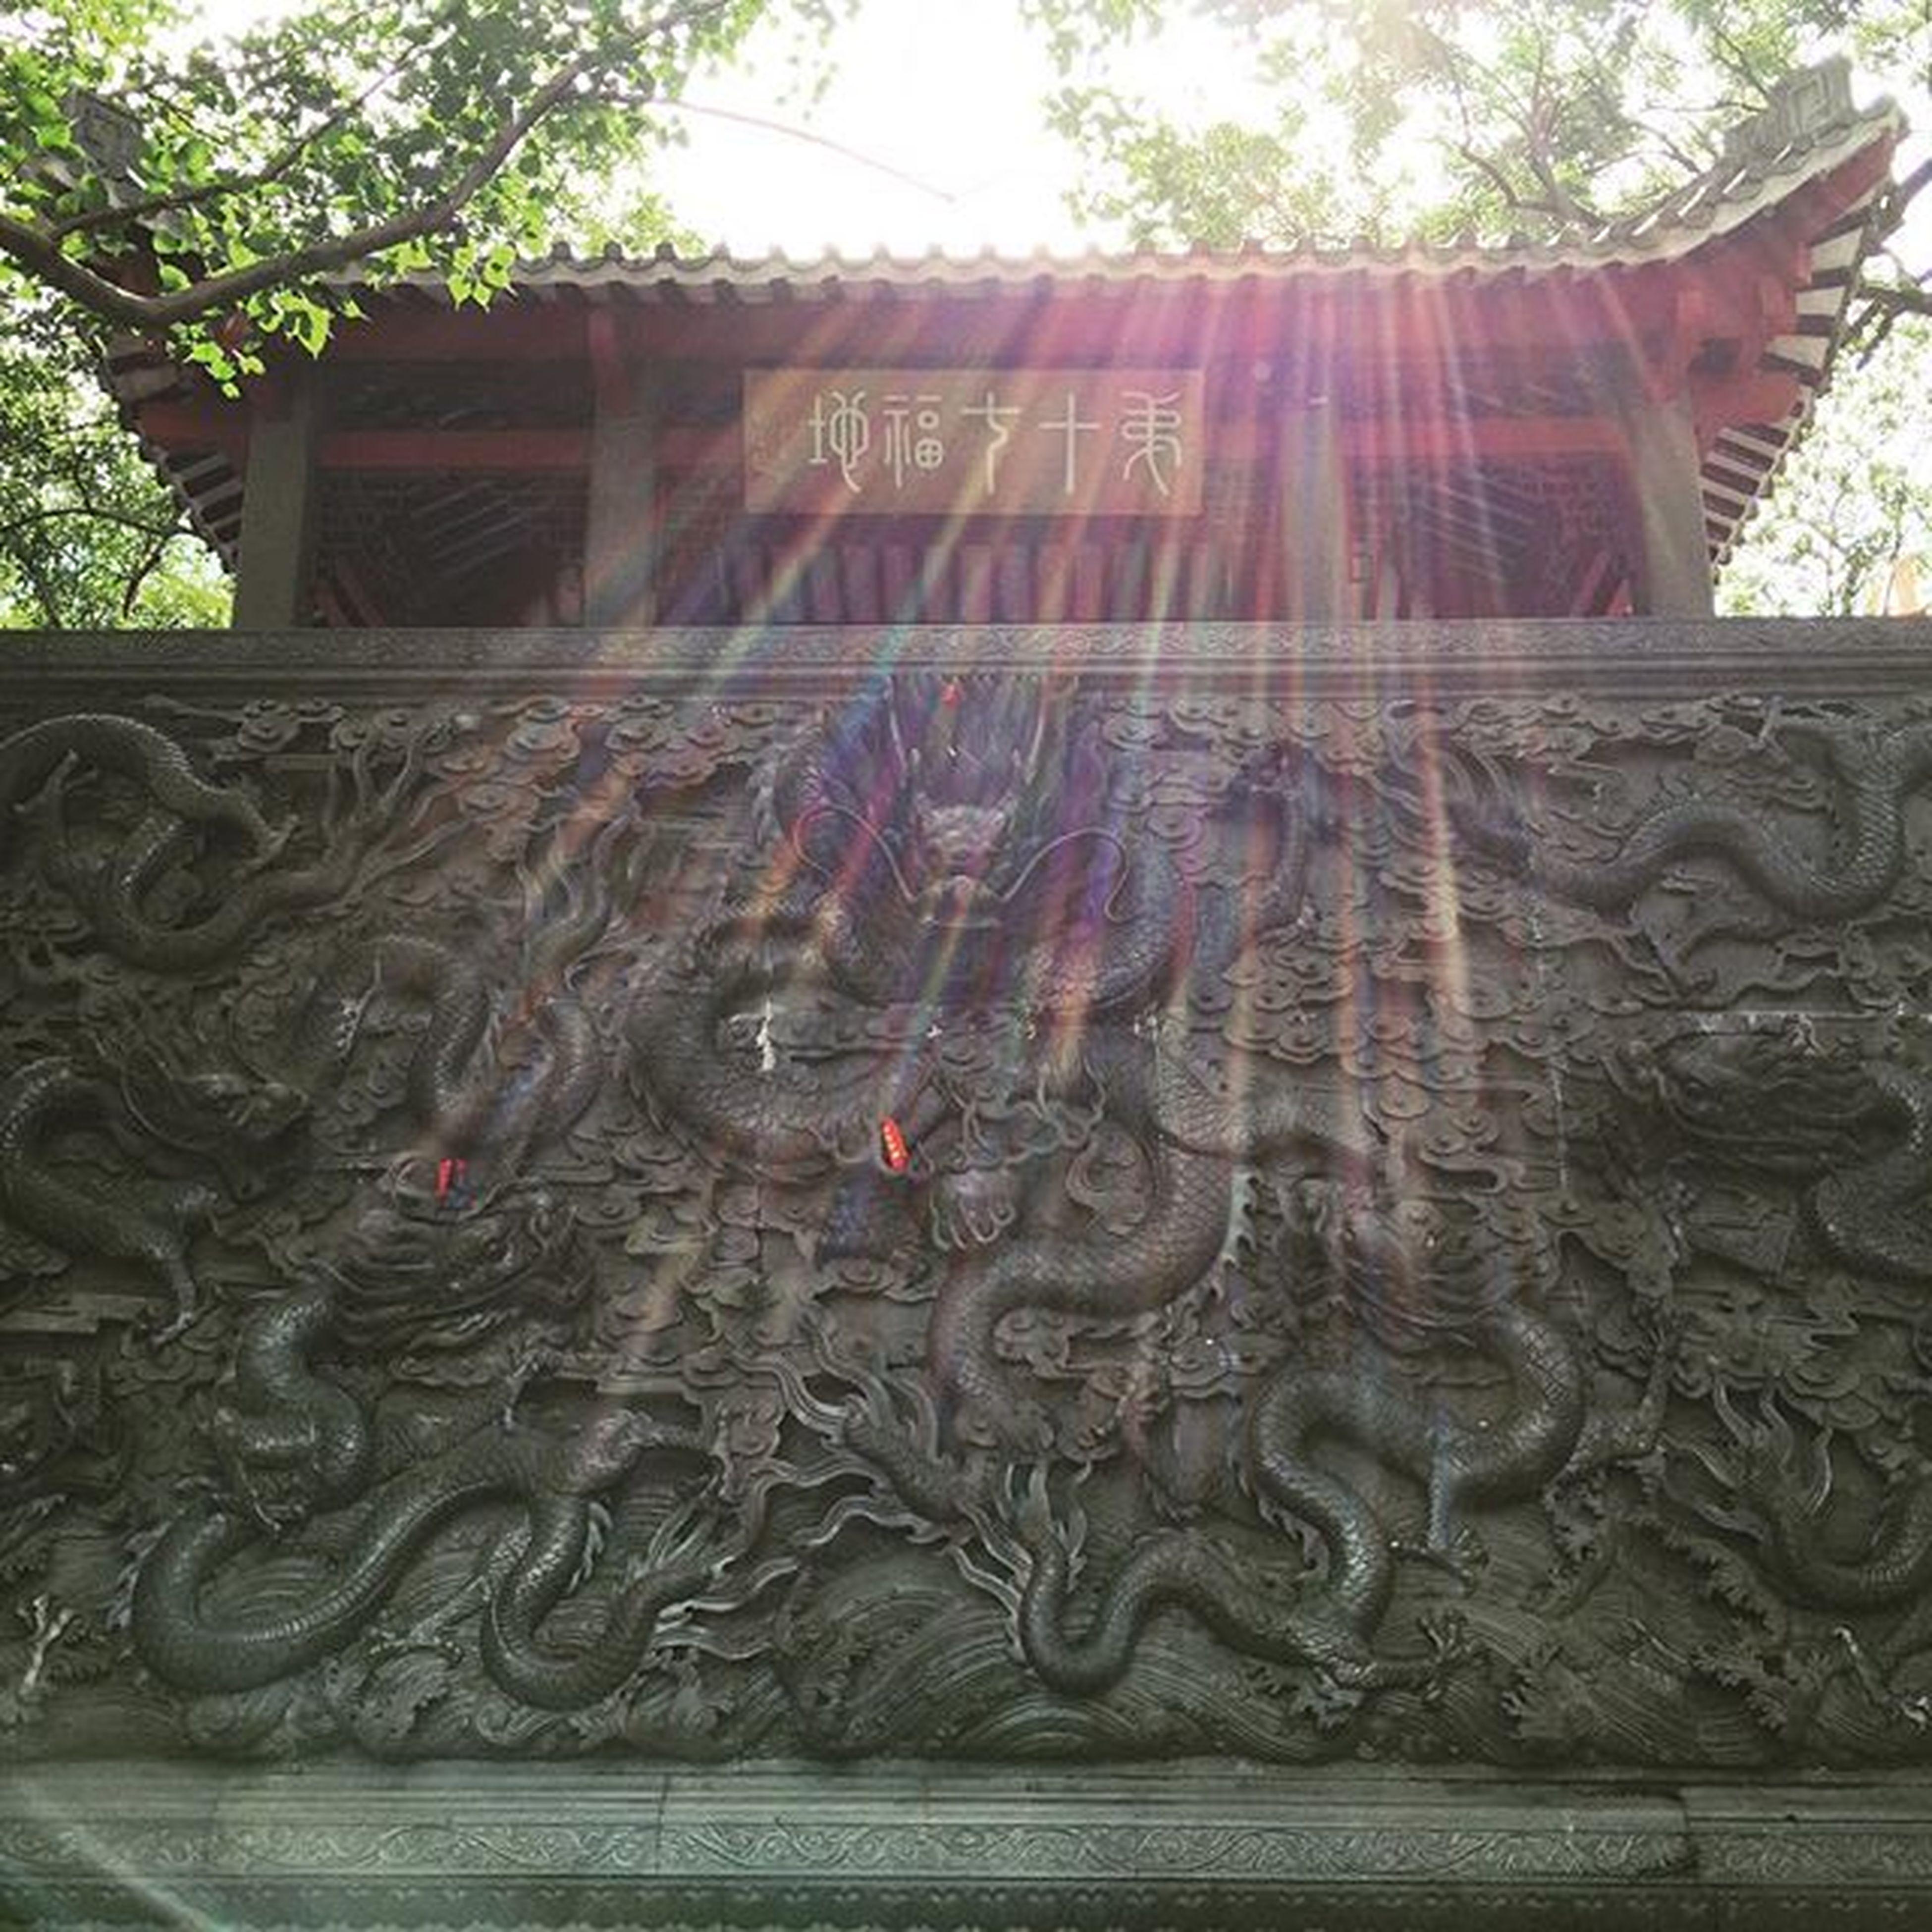 肇庆 鼎湖山 DinghuMountain Zhaoqing 庆云寺